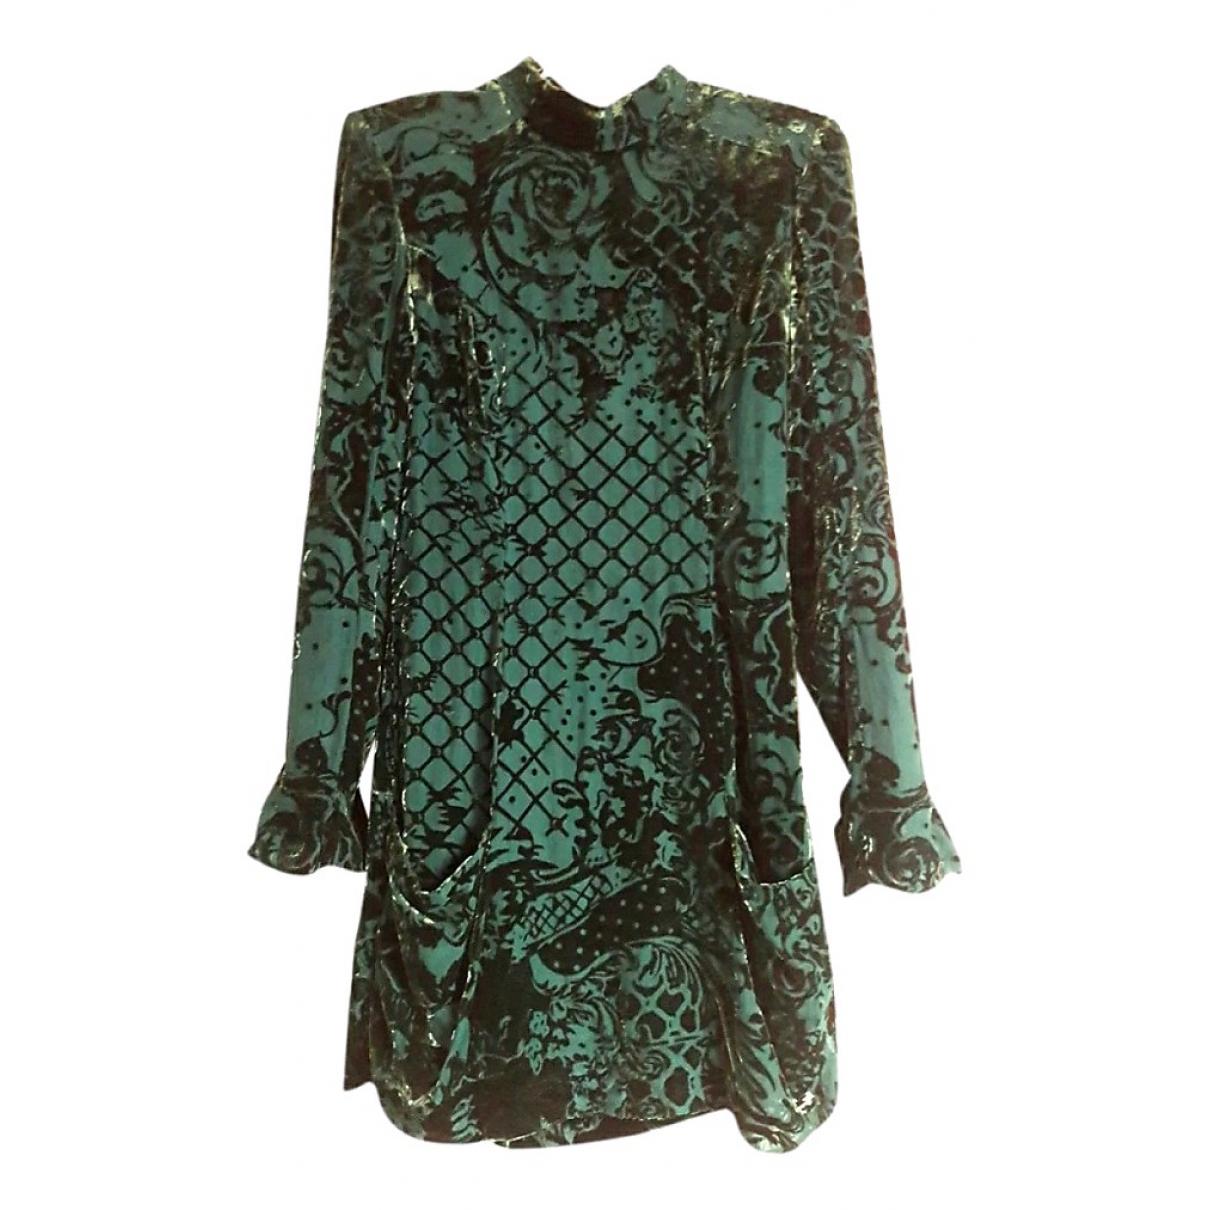 Balmain For H&m \N Kleid in  Gruen Samt